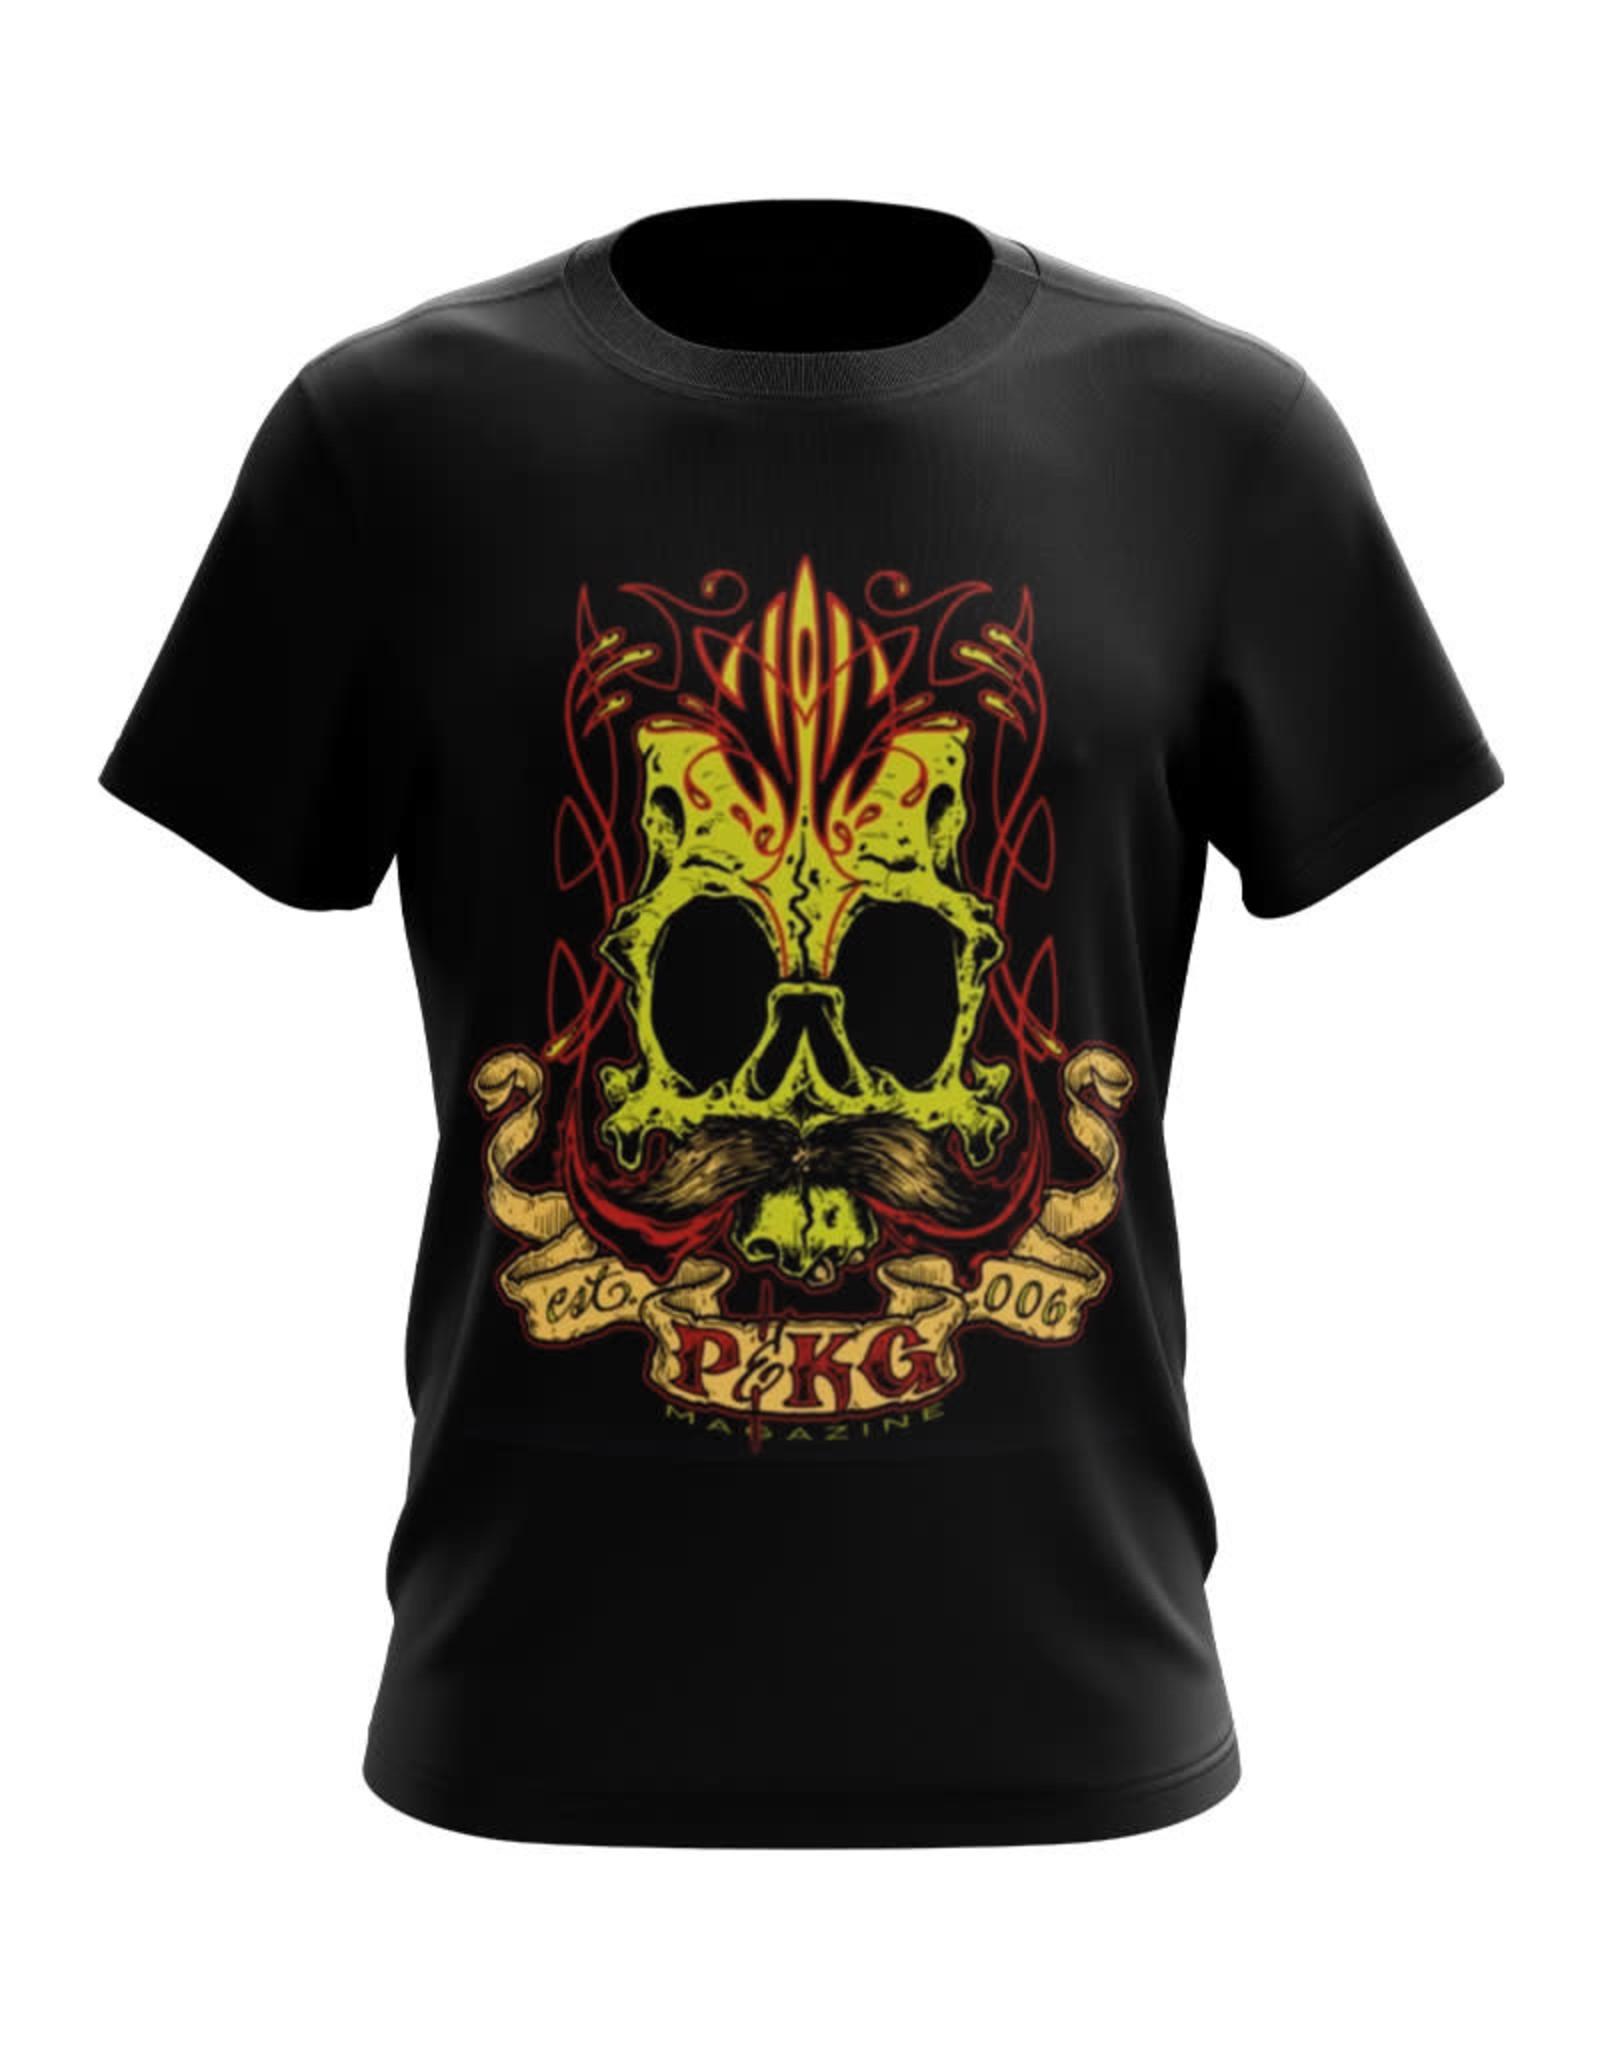 Pinstriping & Kustom graphics magazine Jeral Tidwell PKG T-shirt